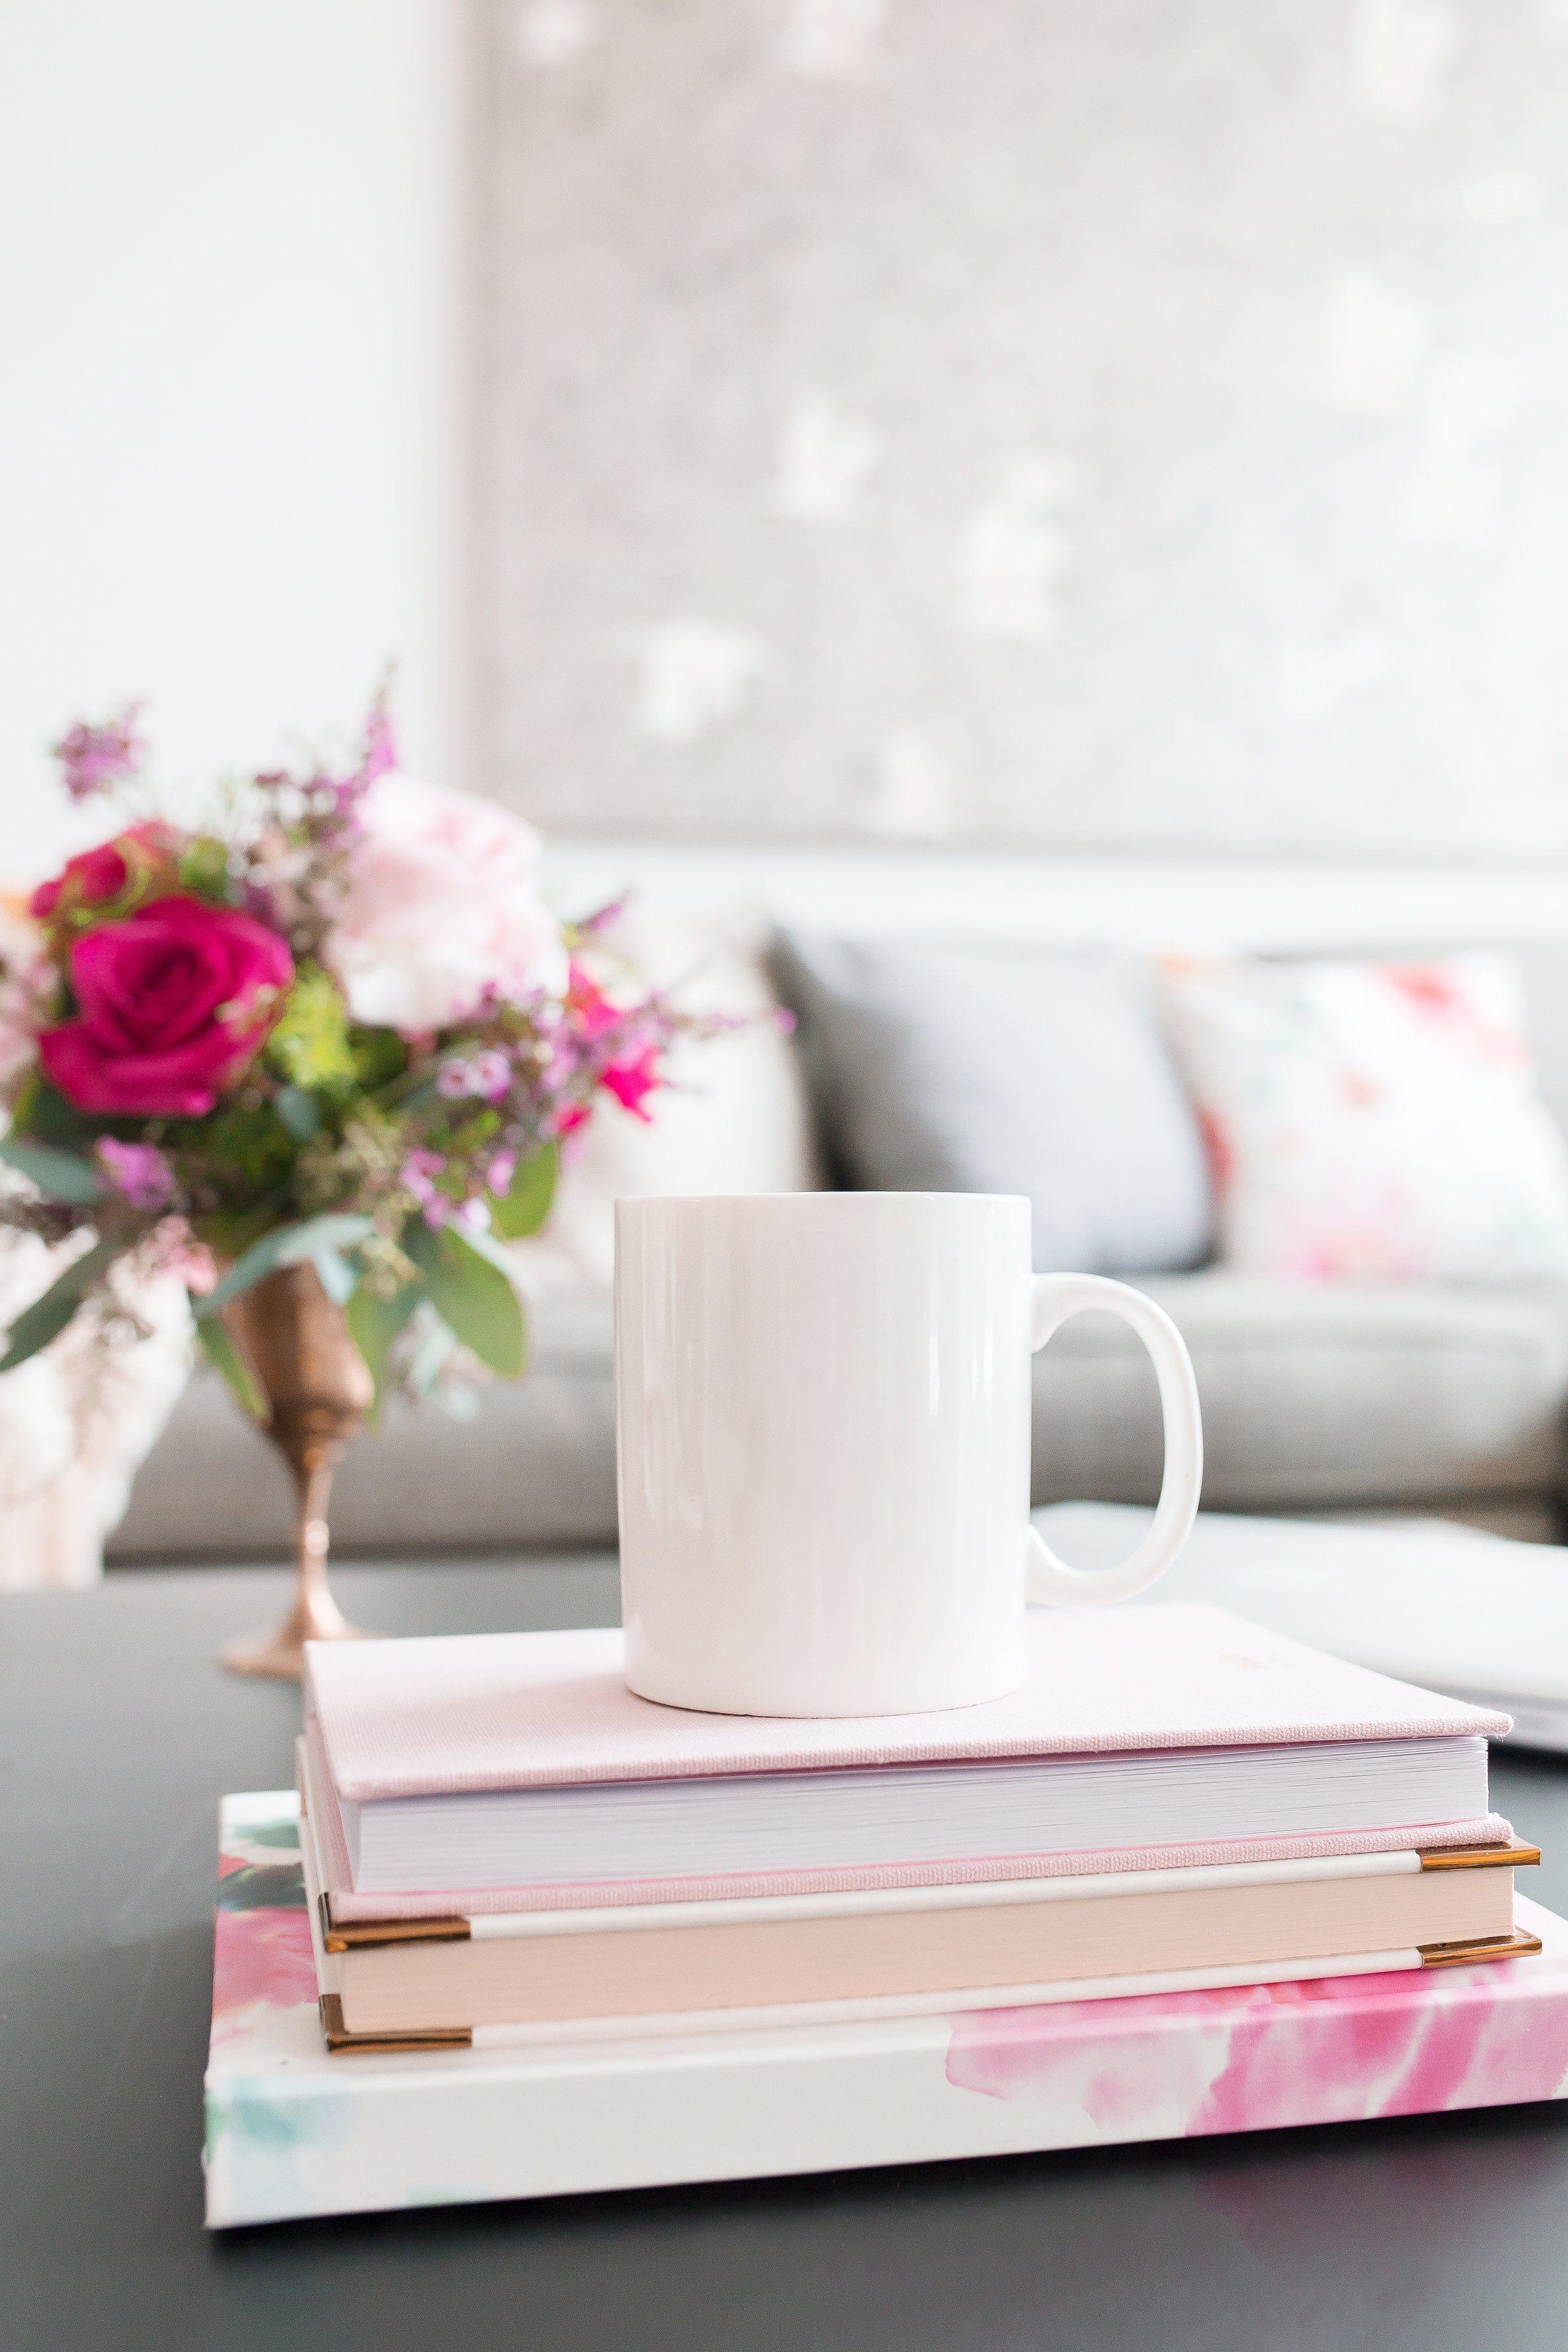 Flowers, books and mug on a coffee table.